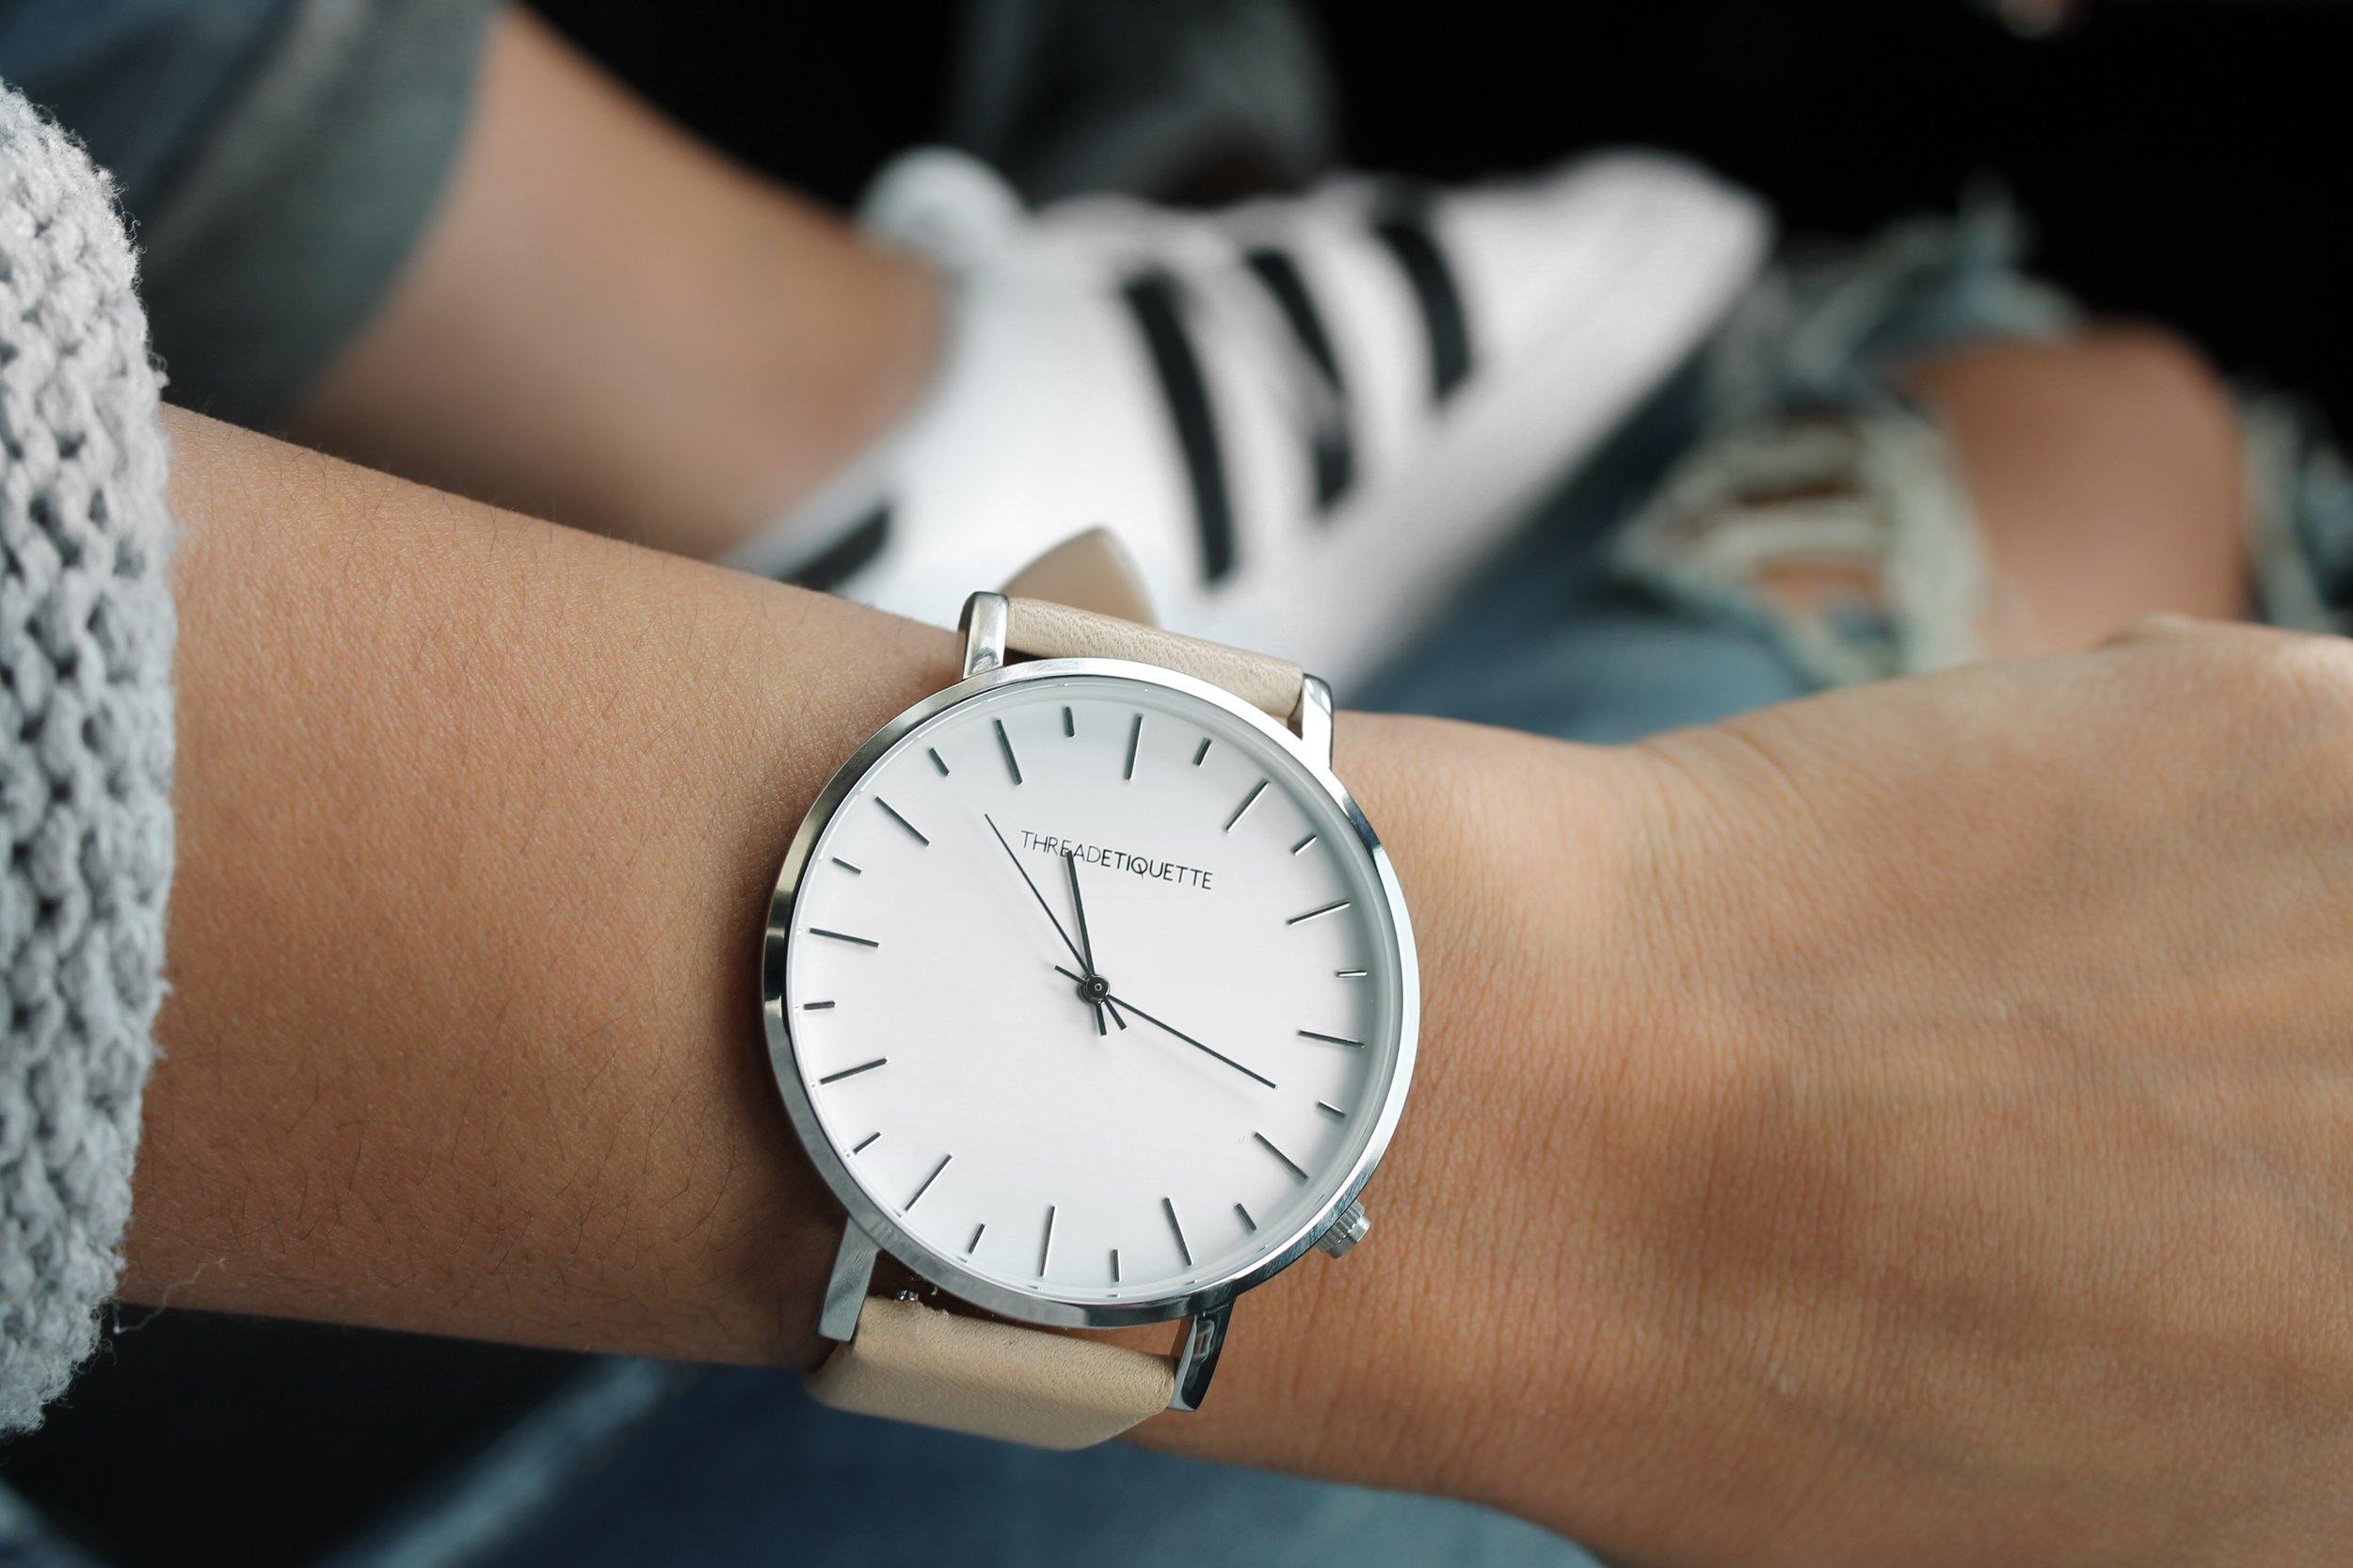 watch-fashion-accessories-clothes-157627.jpeg